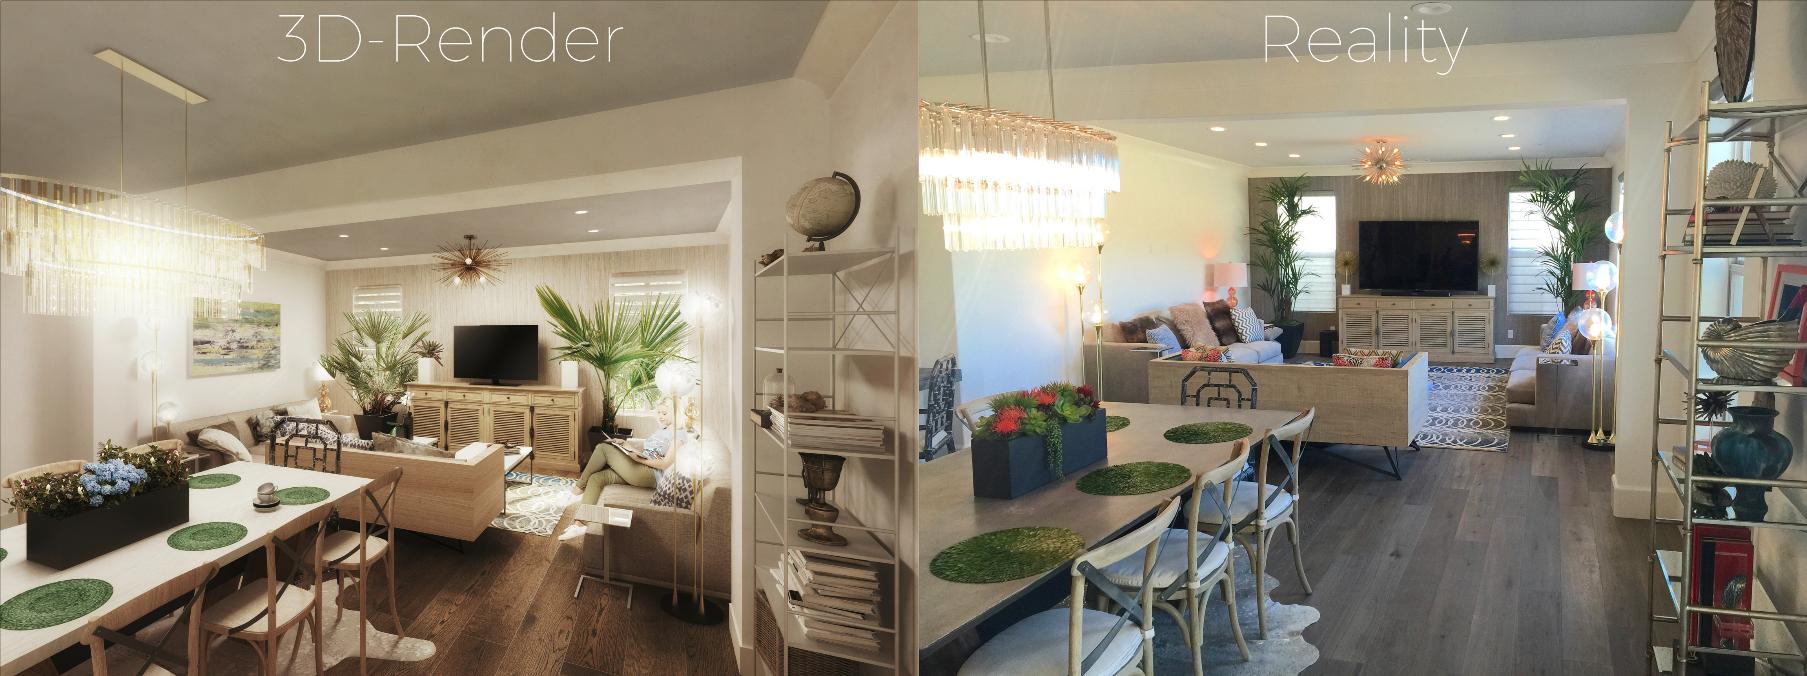 ZachColeDesign-Orange-County-Interior-Design-3D-Rendering-Comparison